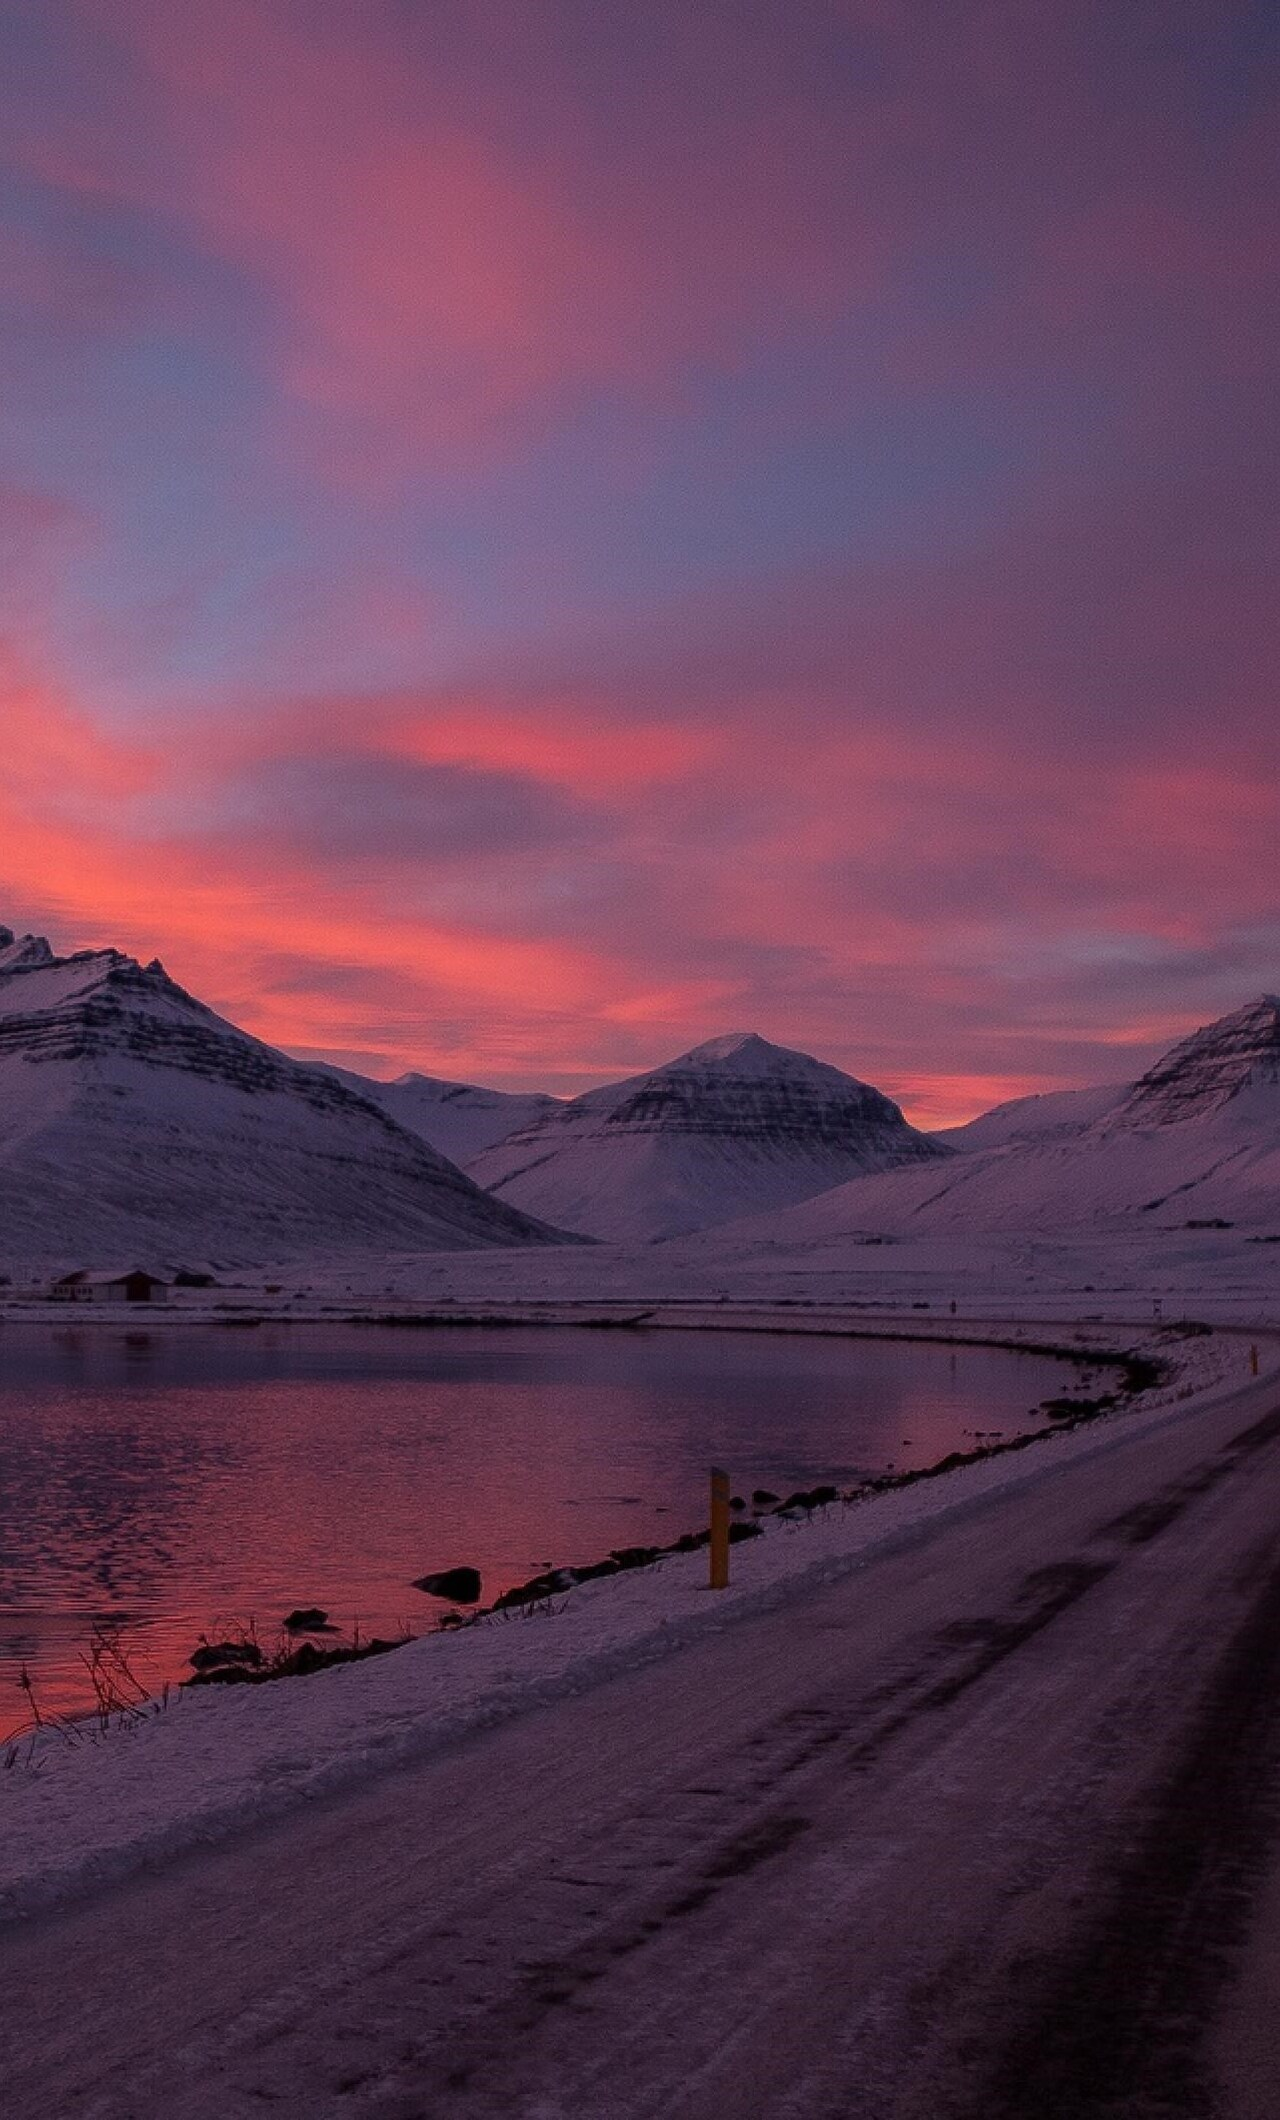 sunset-beach-snow-mountains.jpg